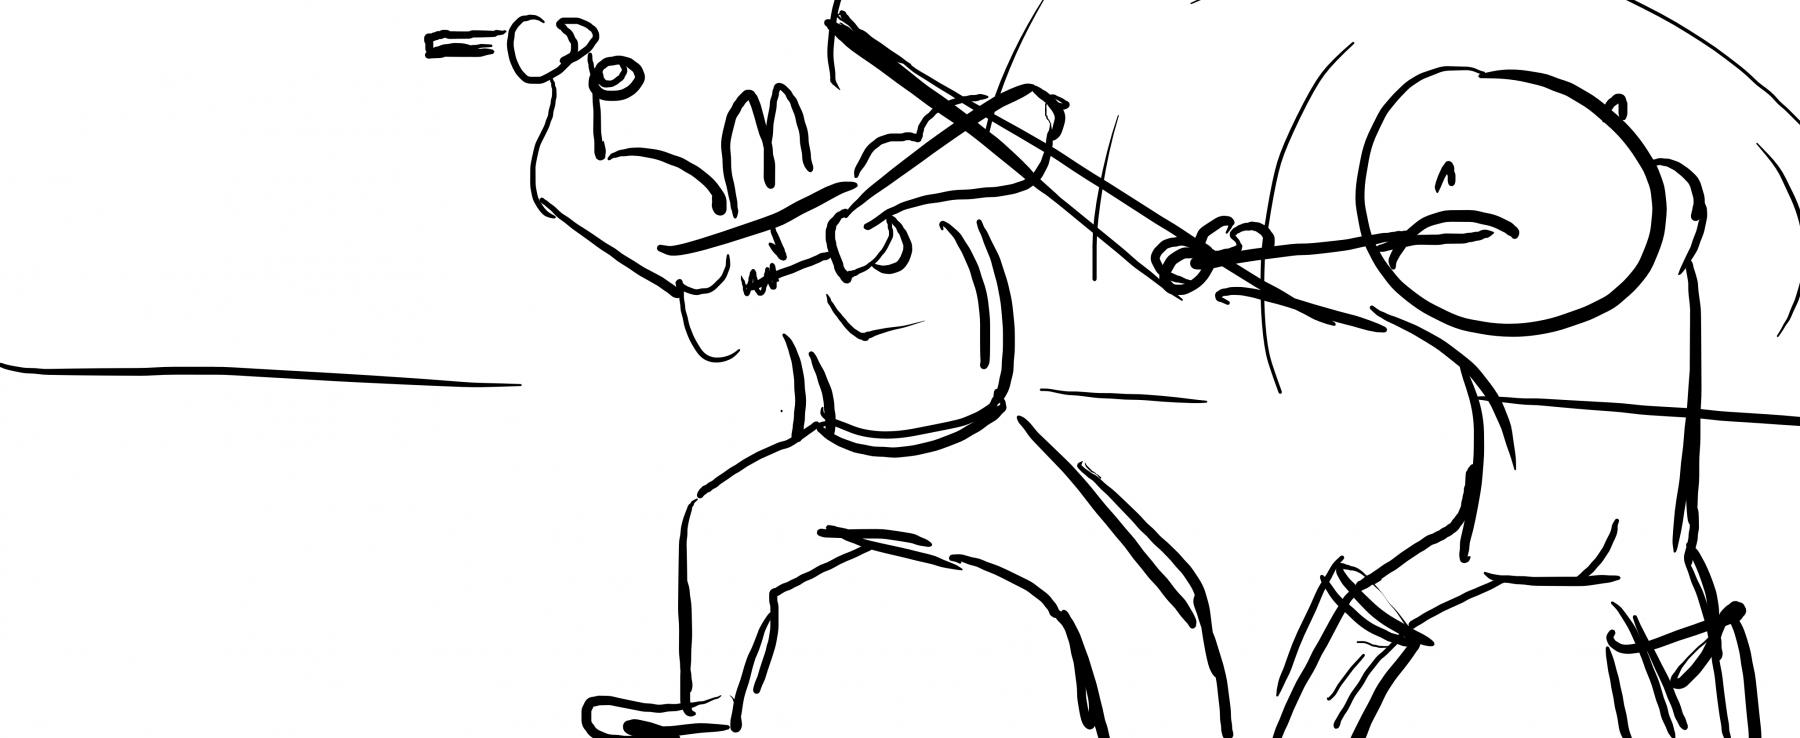 Nut-Thumbnail-Rough-Board00262